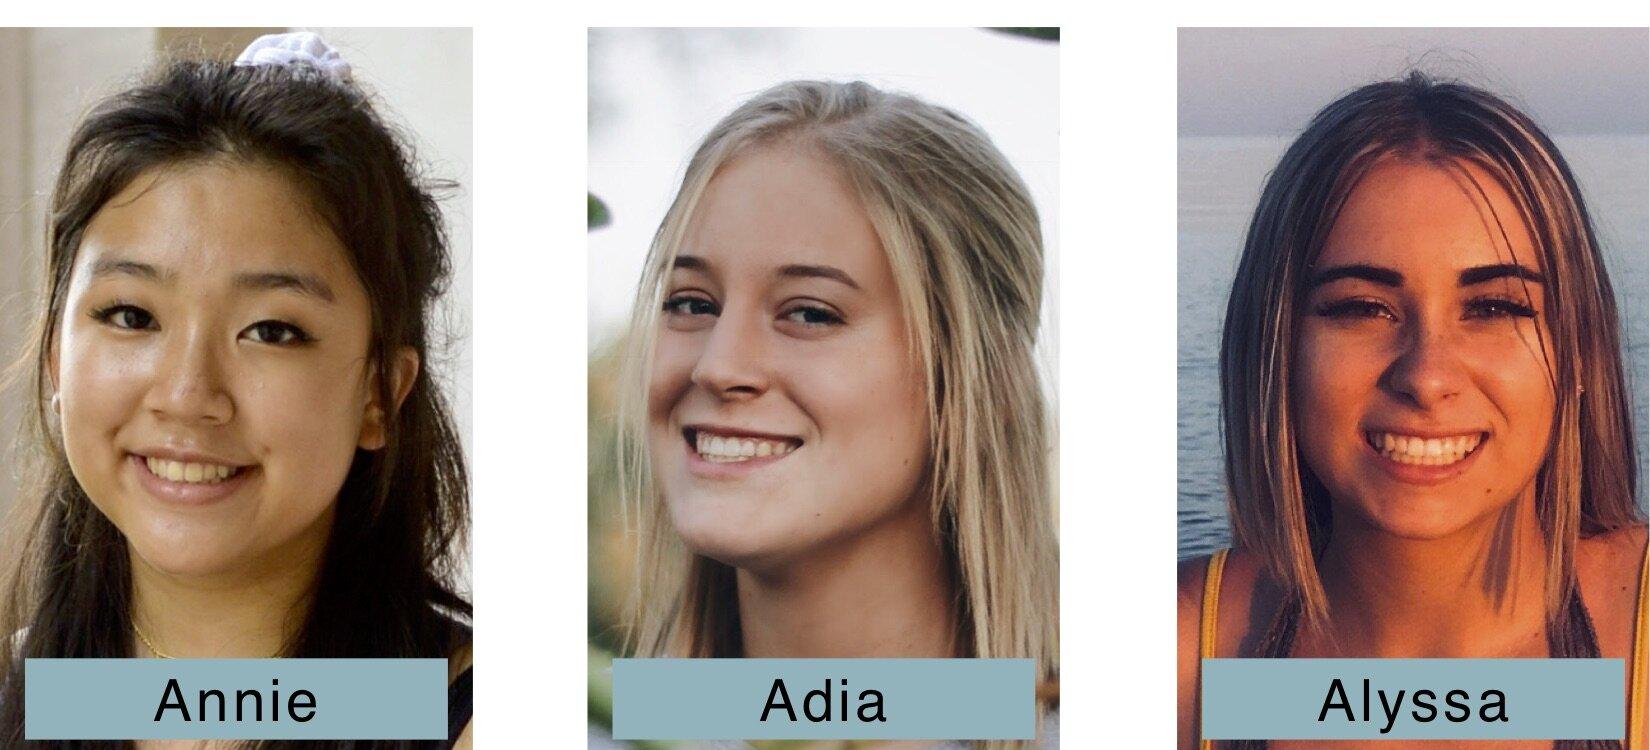 Annie Adia Alyssa.jpg